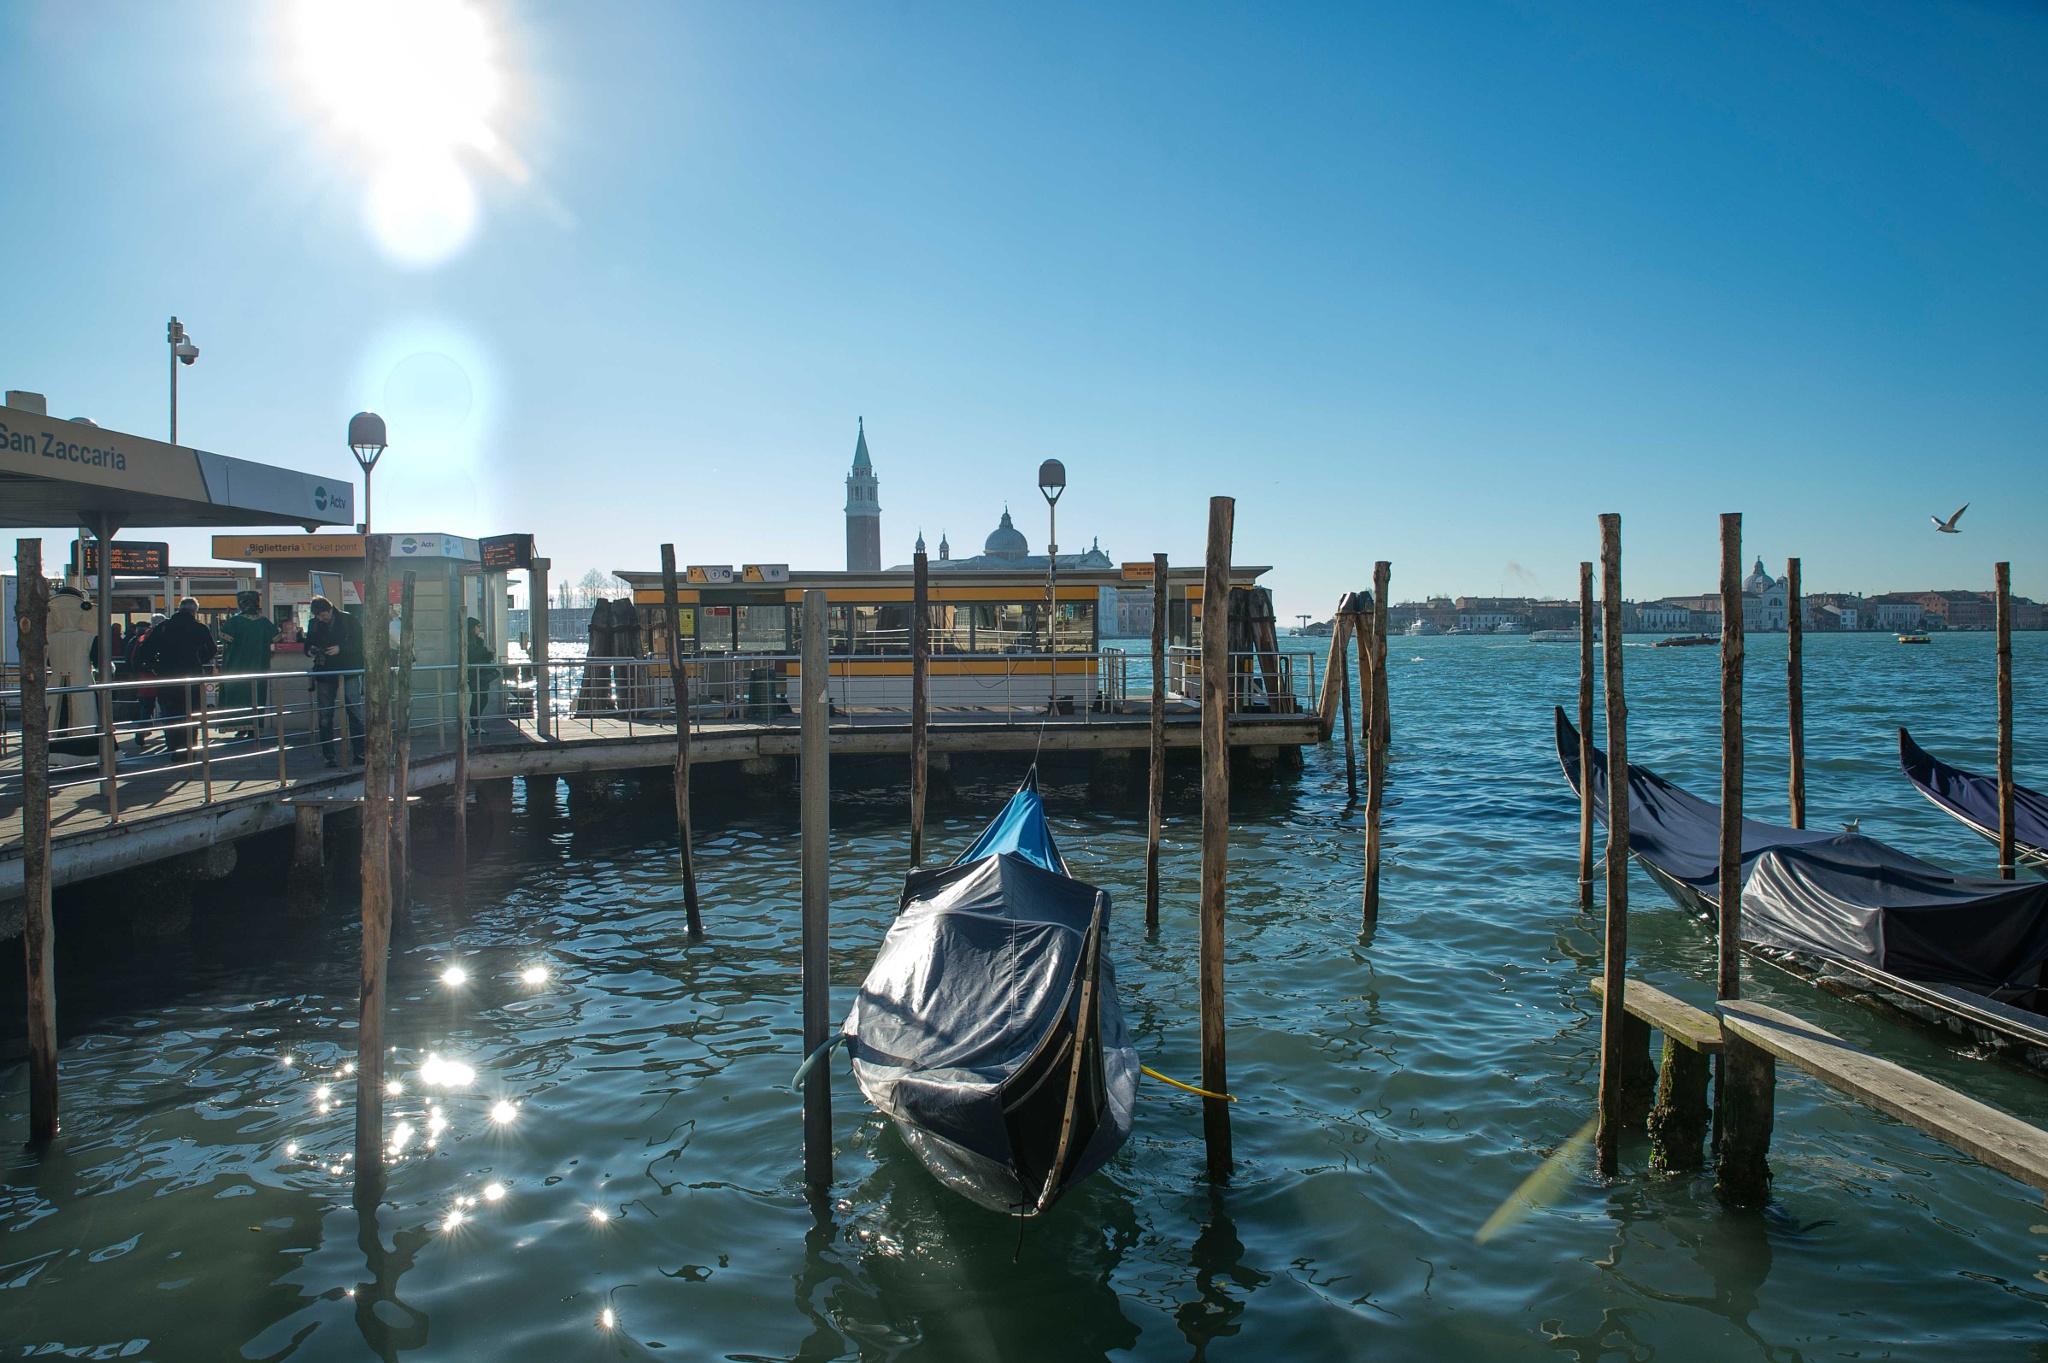 Venezia 2016 by beautiful flower.